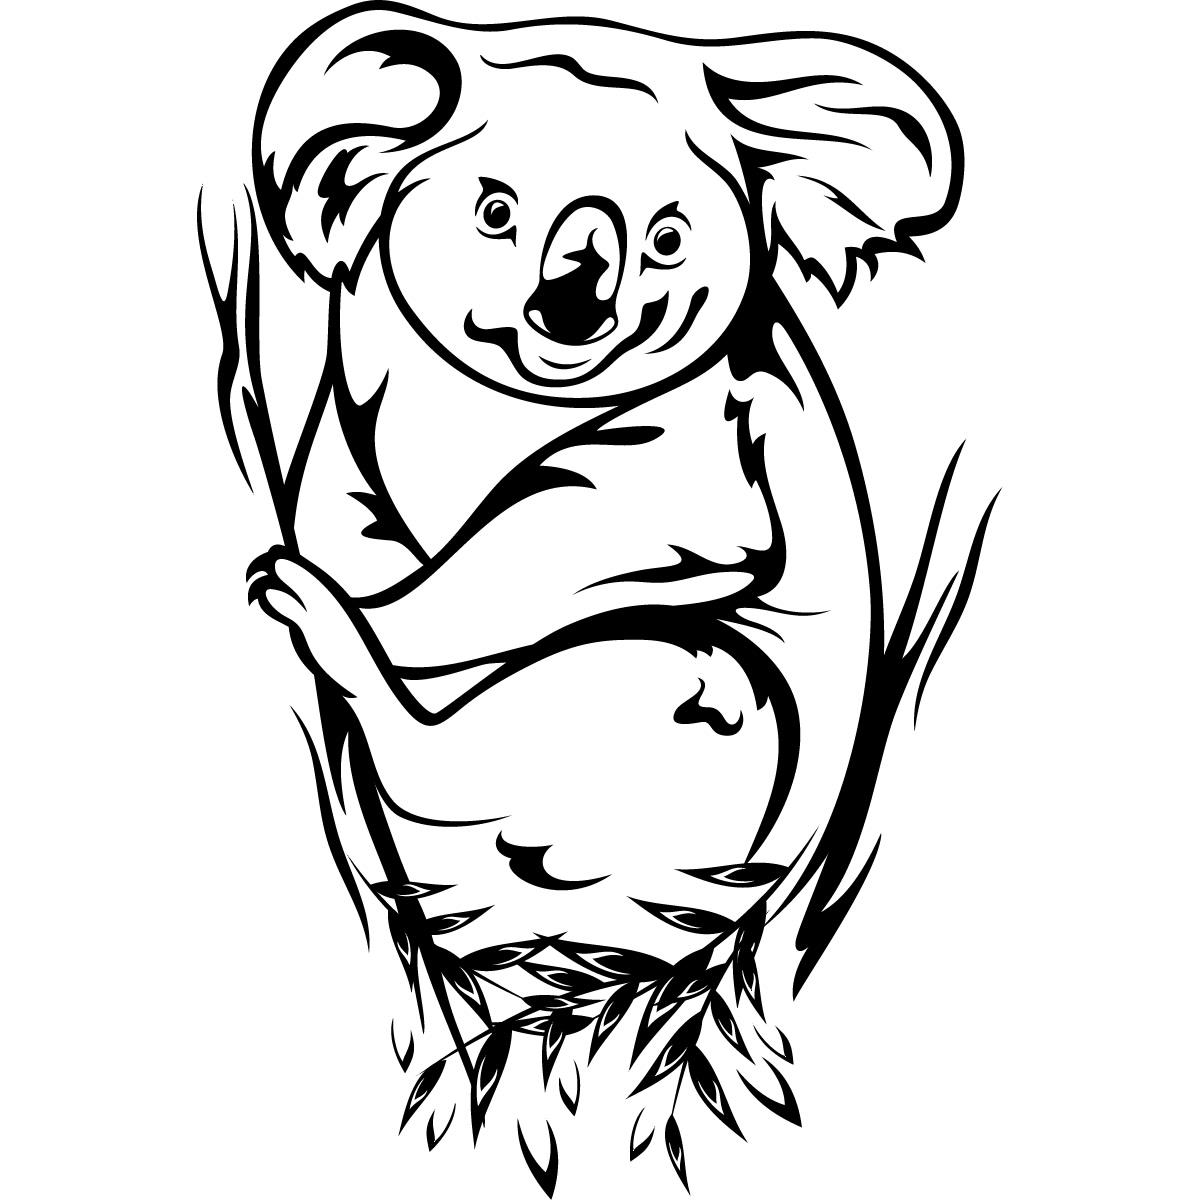 Koala black and white clipart kid.